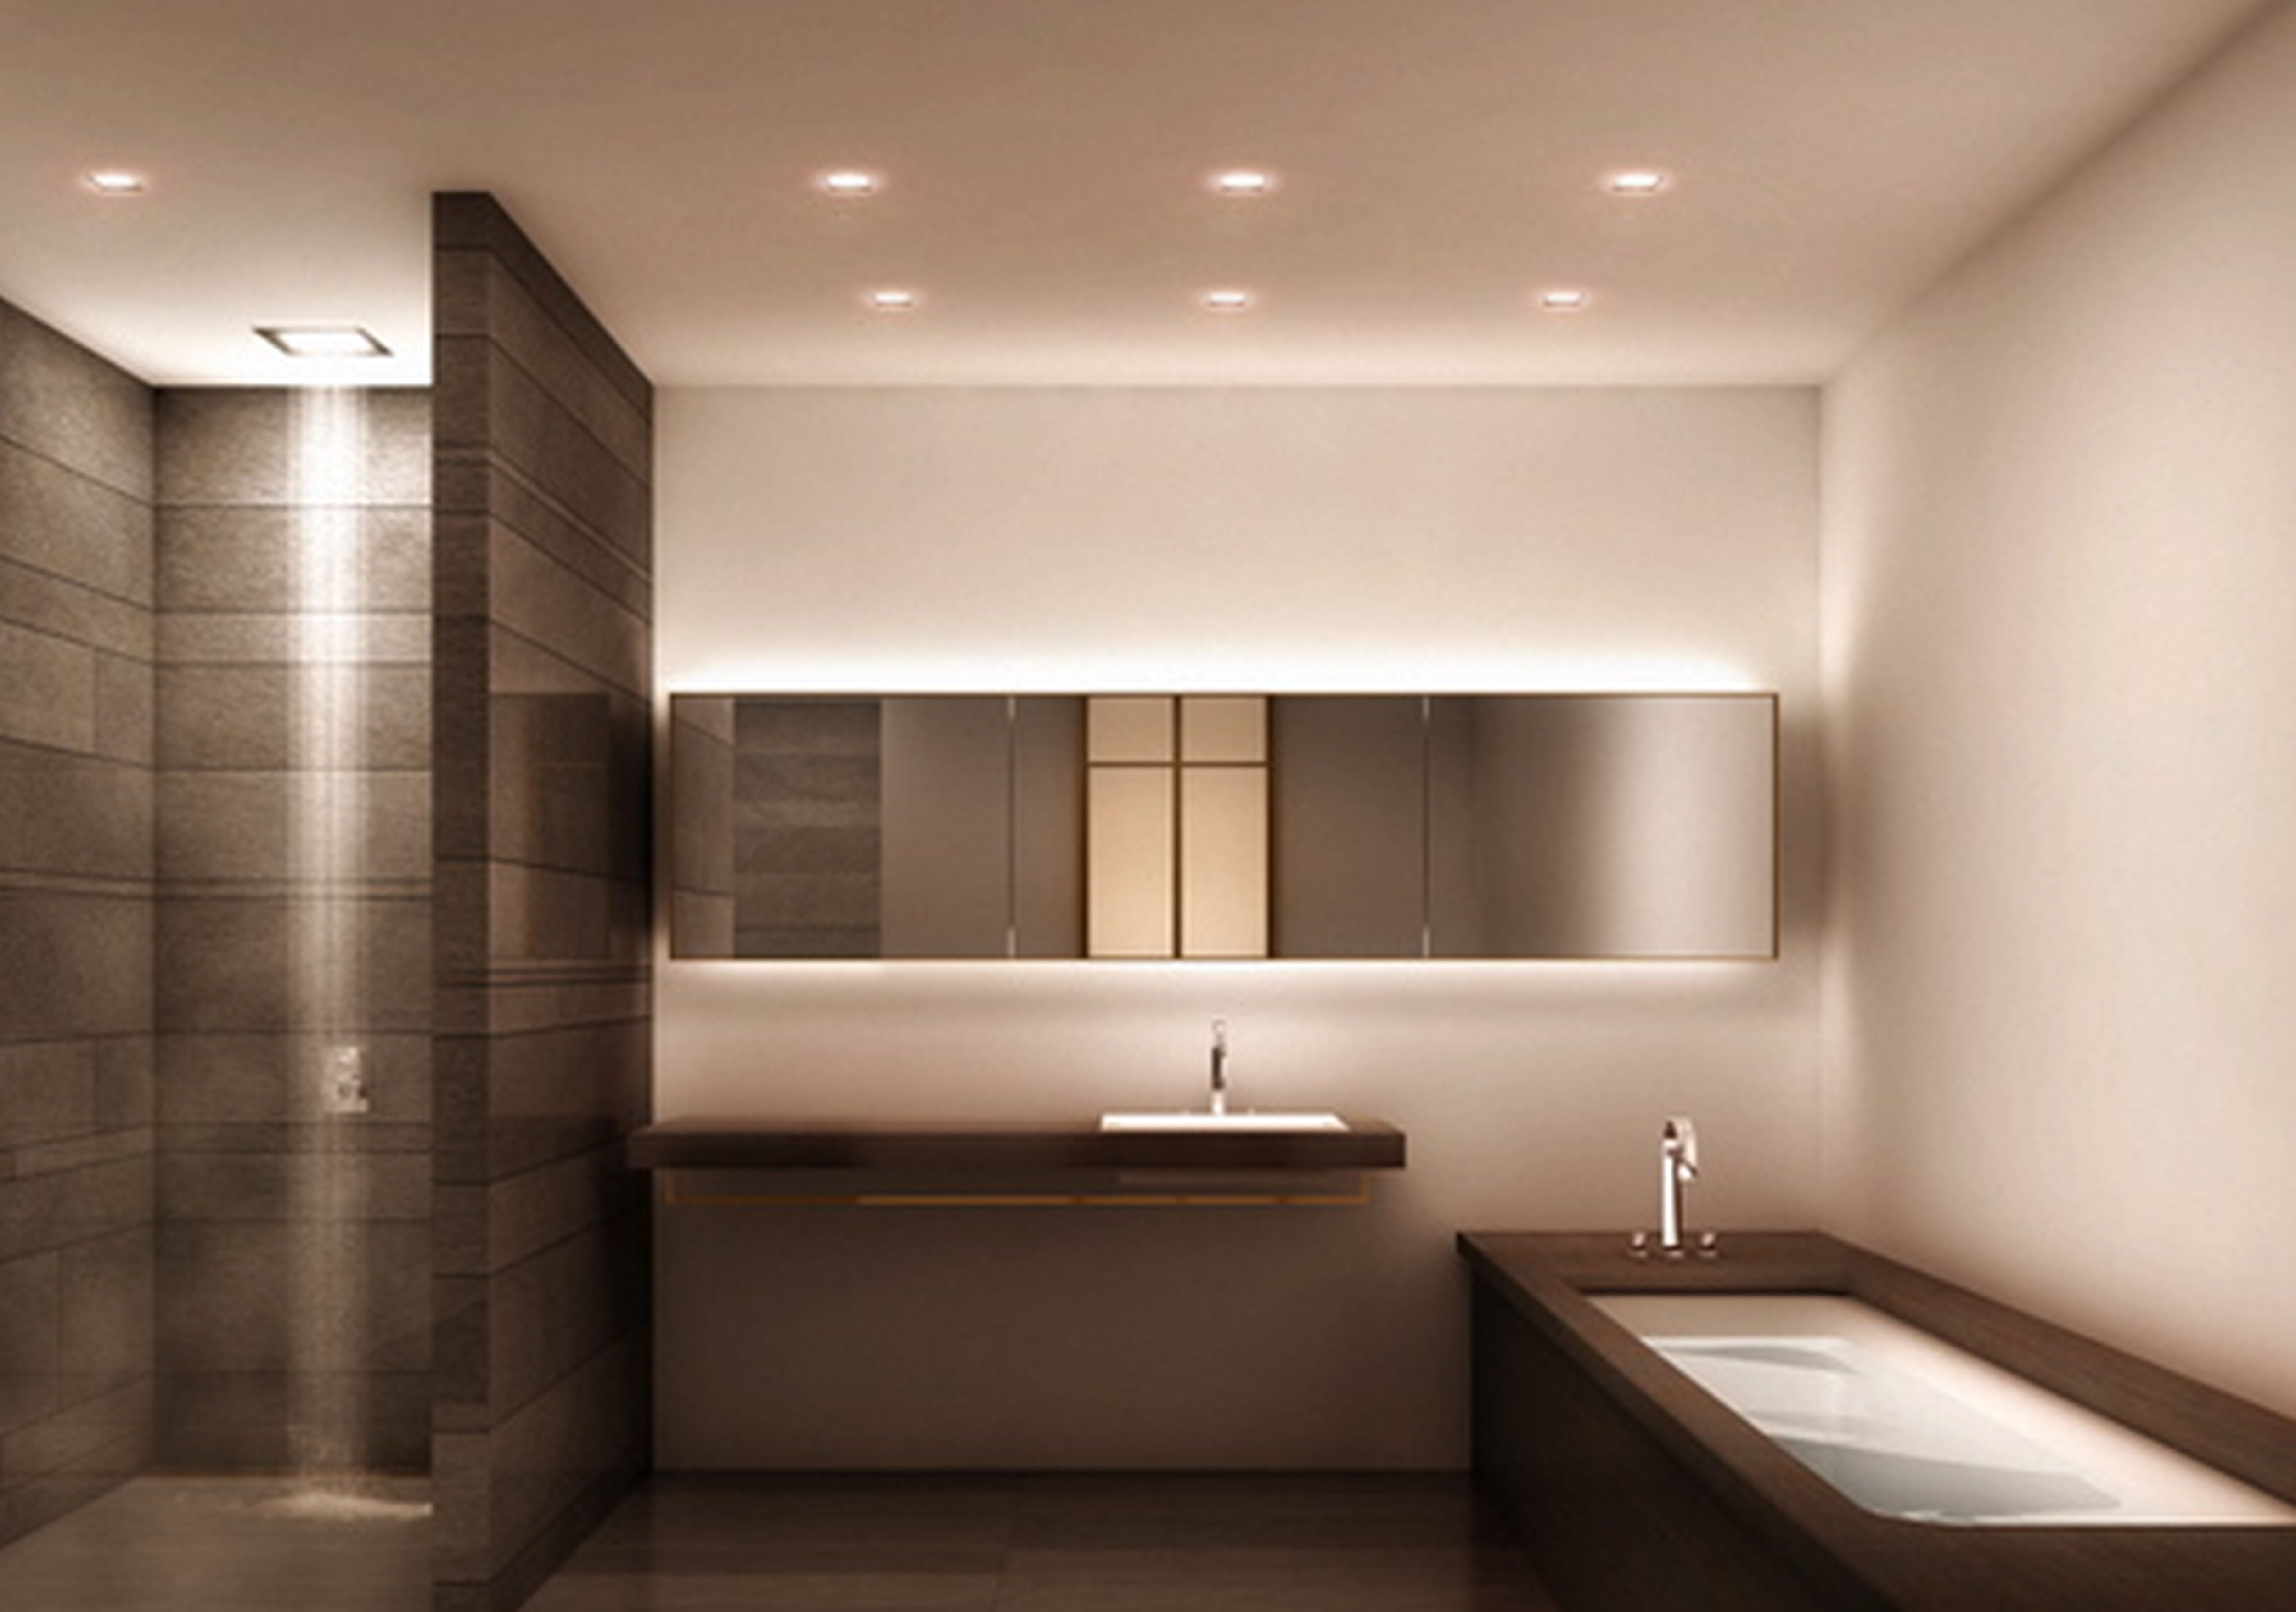 luxury modern bathroom sinks wallpaper-Amazing Modern Bathroom Sinks Layout